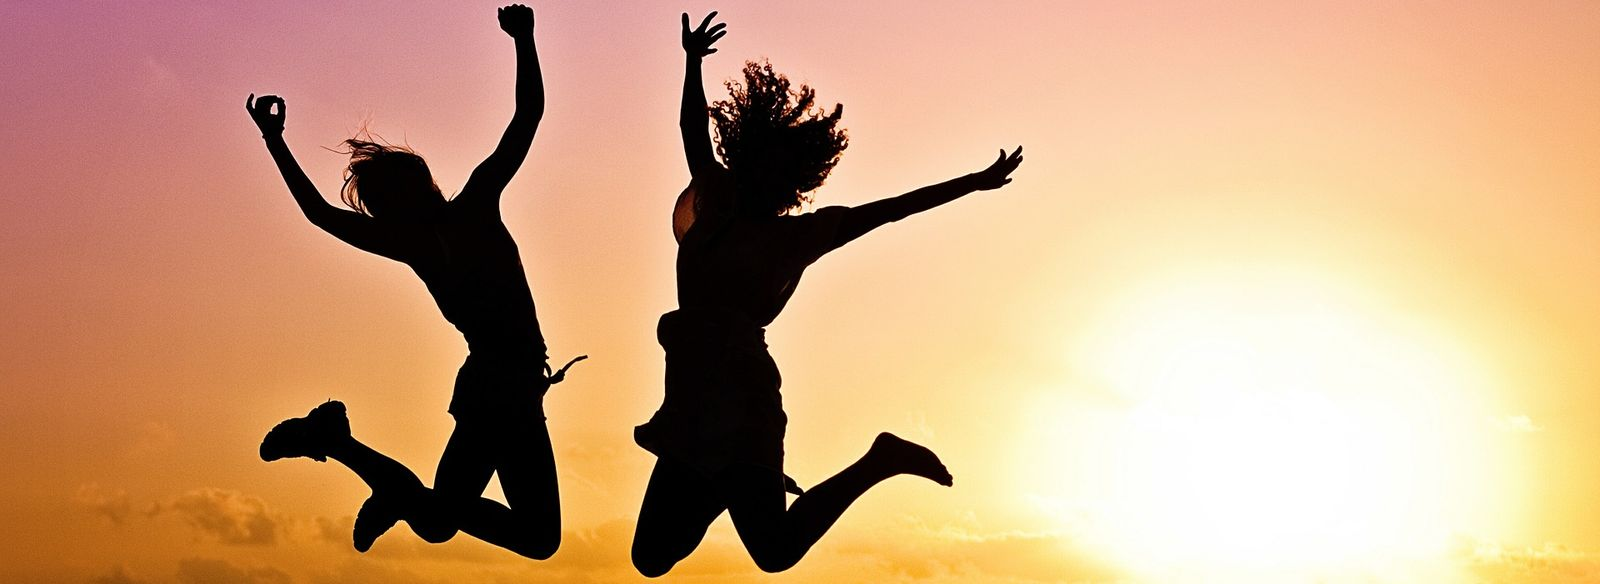 Mindfulness y Auto compasión Terapia Ocupacional, Psicología Clínica, terapias holísticas, osteopatía, psicología clínica, fisioterapia, Instituto de Técnicas Holísticas en Majadahonda